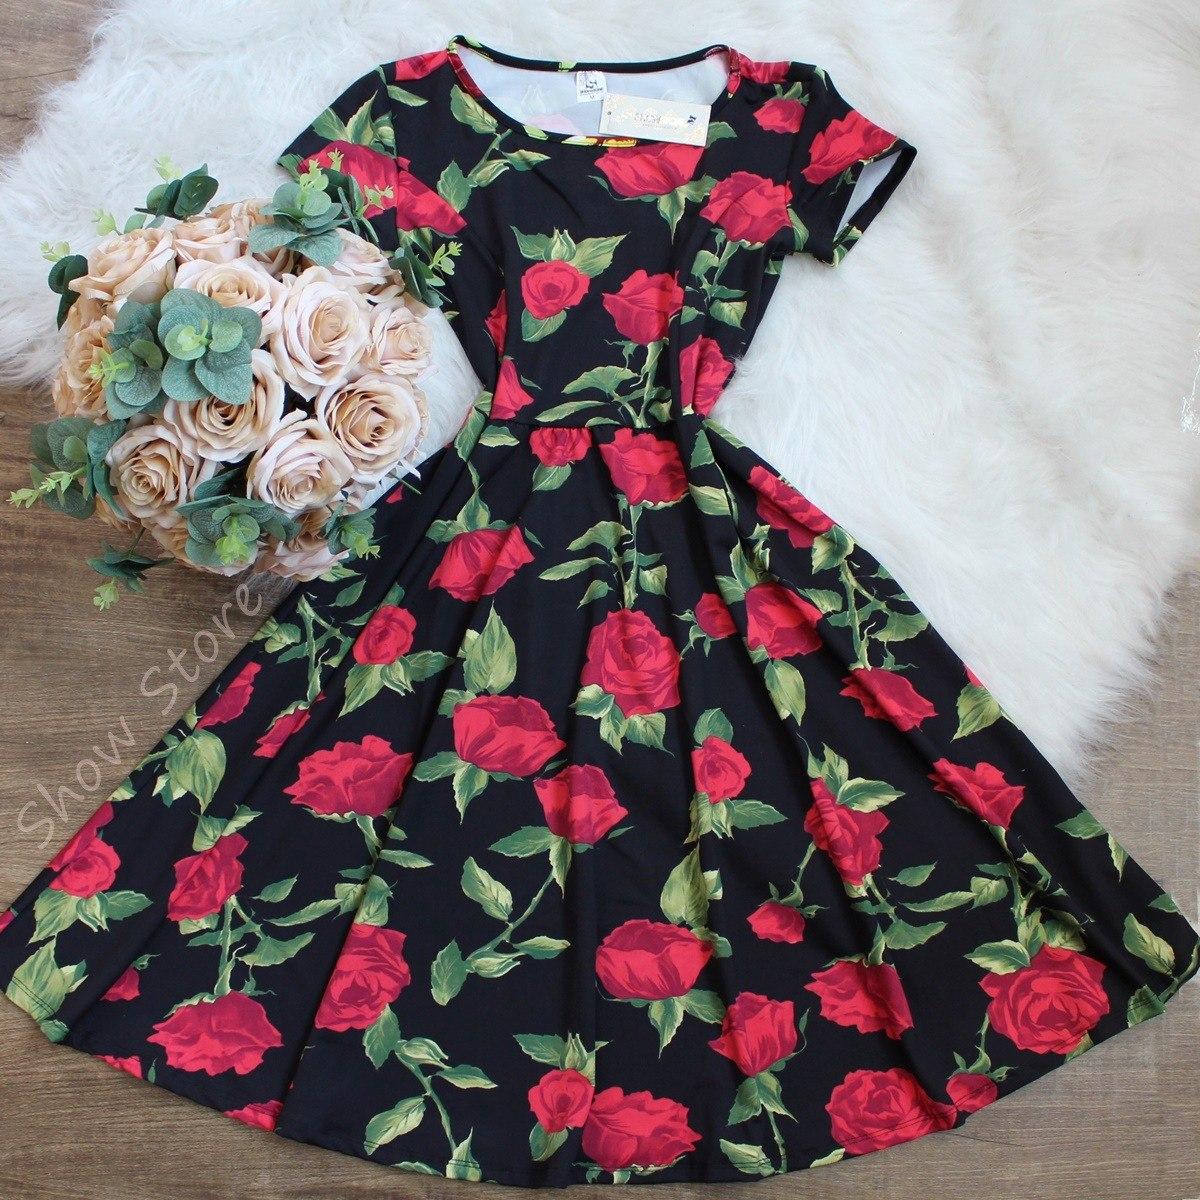 4a1d5f039 roupas femininas vestido midi estilo bonequinha princesa 709. Carregando  zoom.